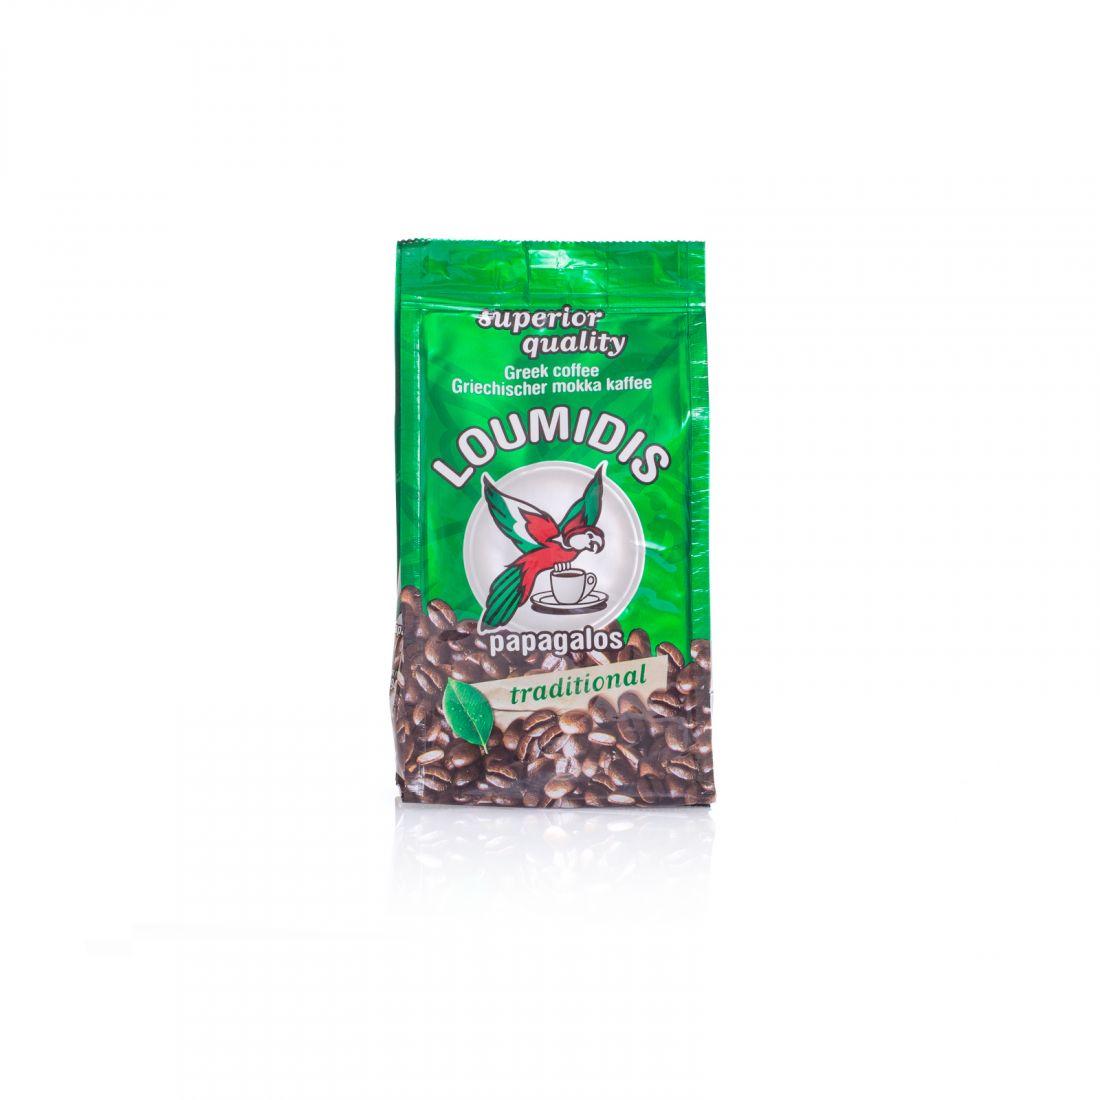 Кофе натуральный молотый Loumidis Papagalos - 194 гр